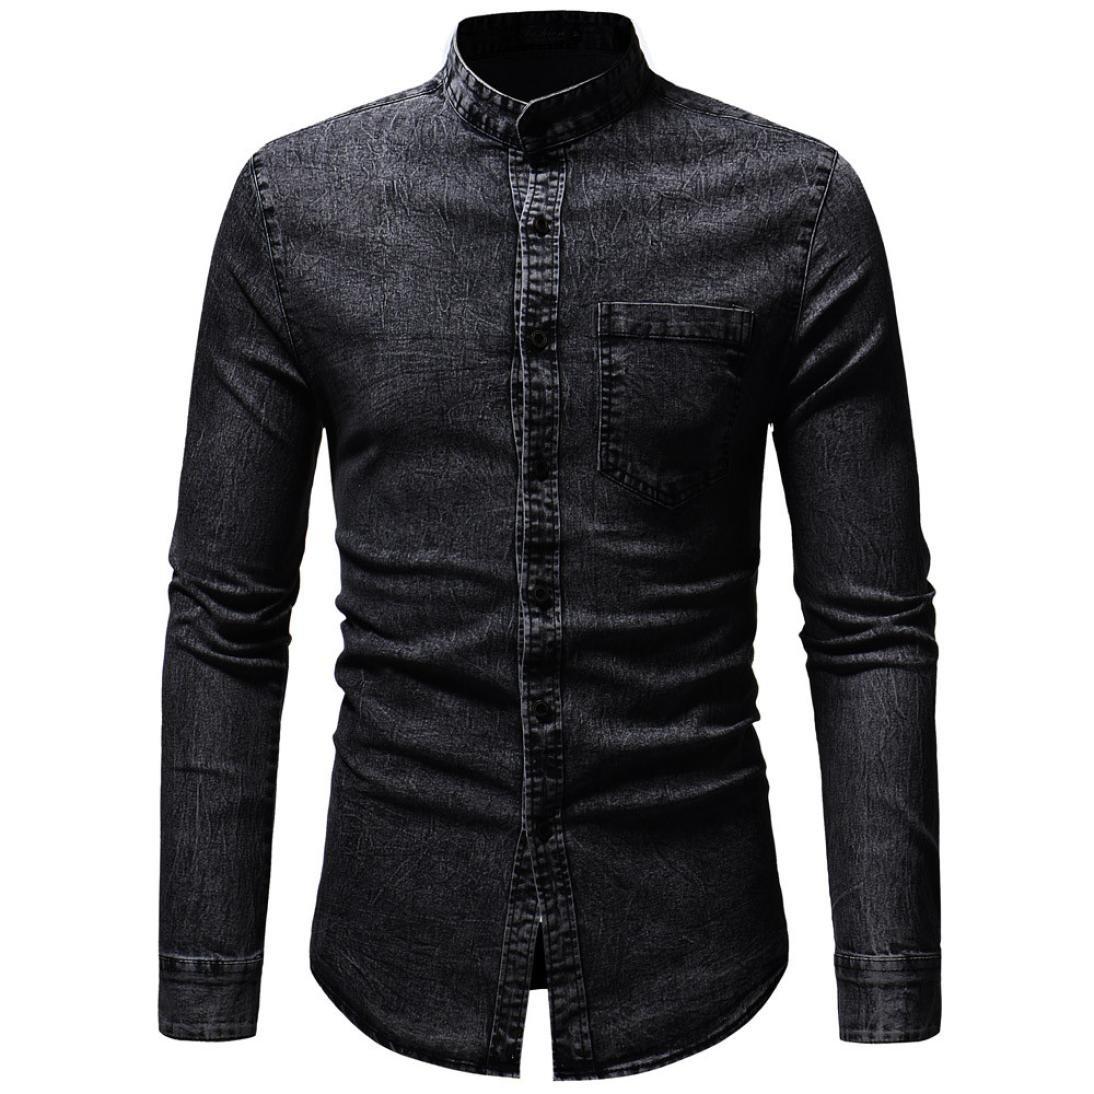 Pervobs Long Sleeve Shirts, Big Promotion! Men's Autumn Vintage Distressed Solid Denim Long Sleeve Button Down Shirt Top Blouse (M, Black)